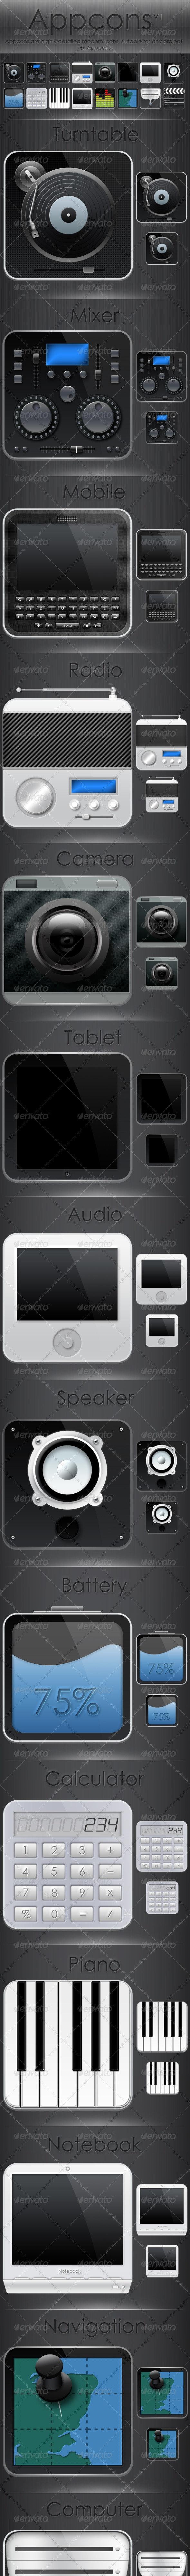 Appcons V1 - Technology Icons